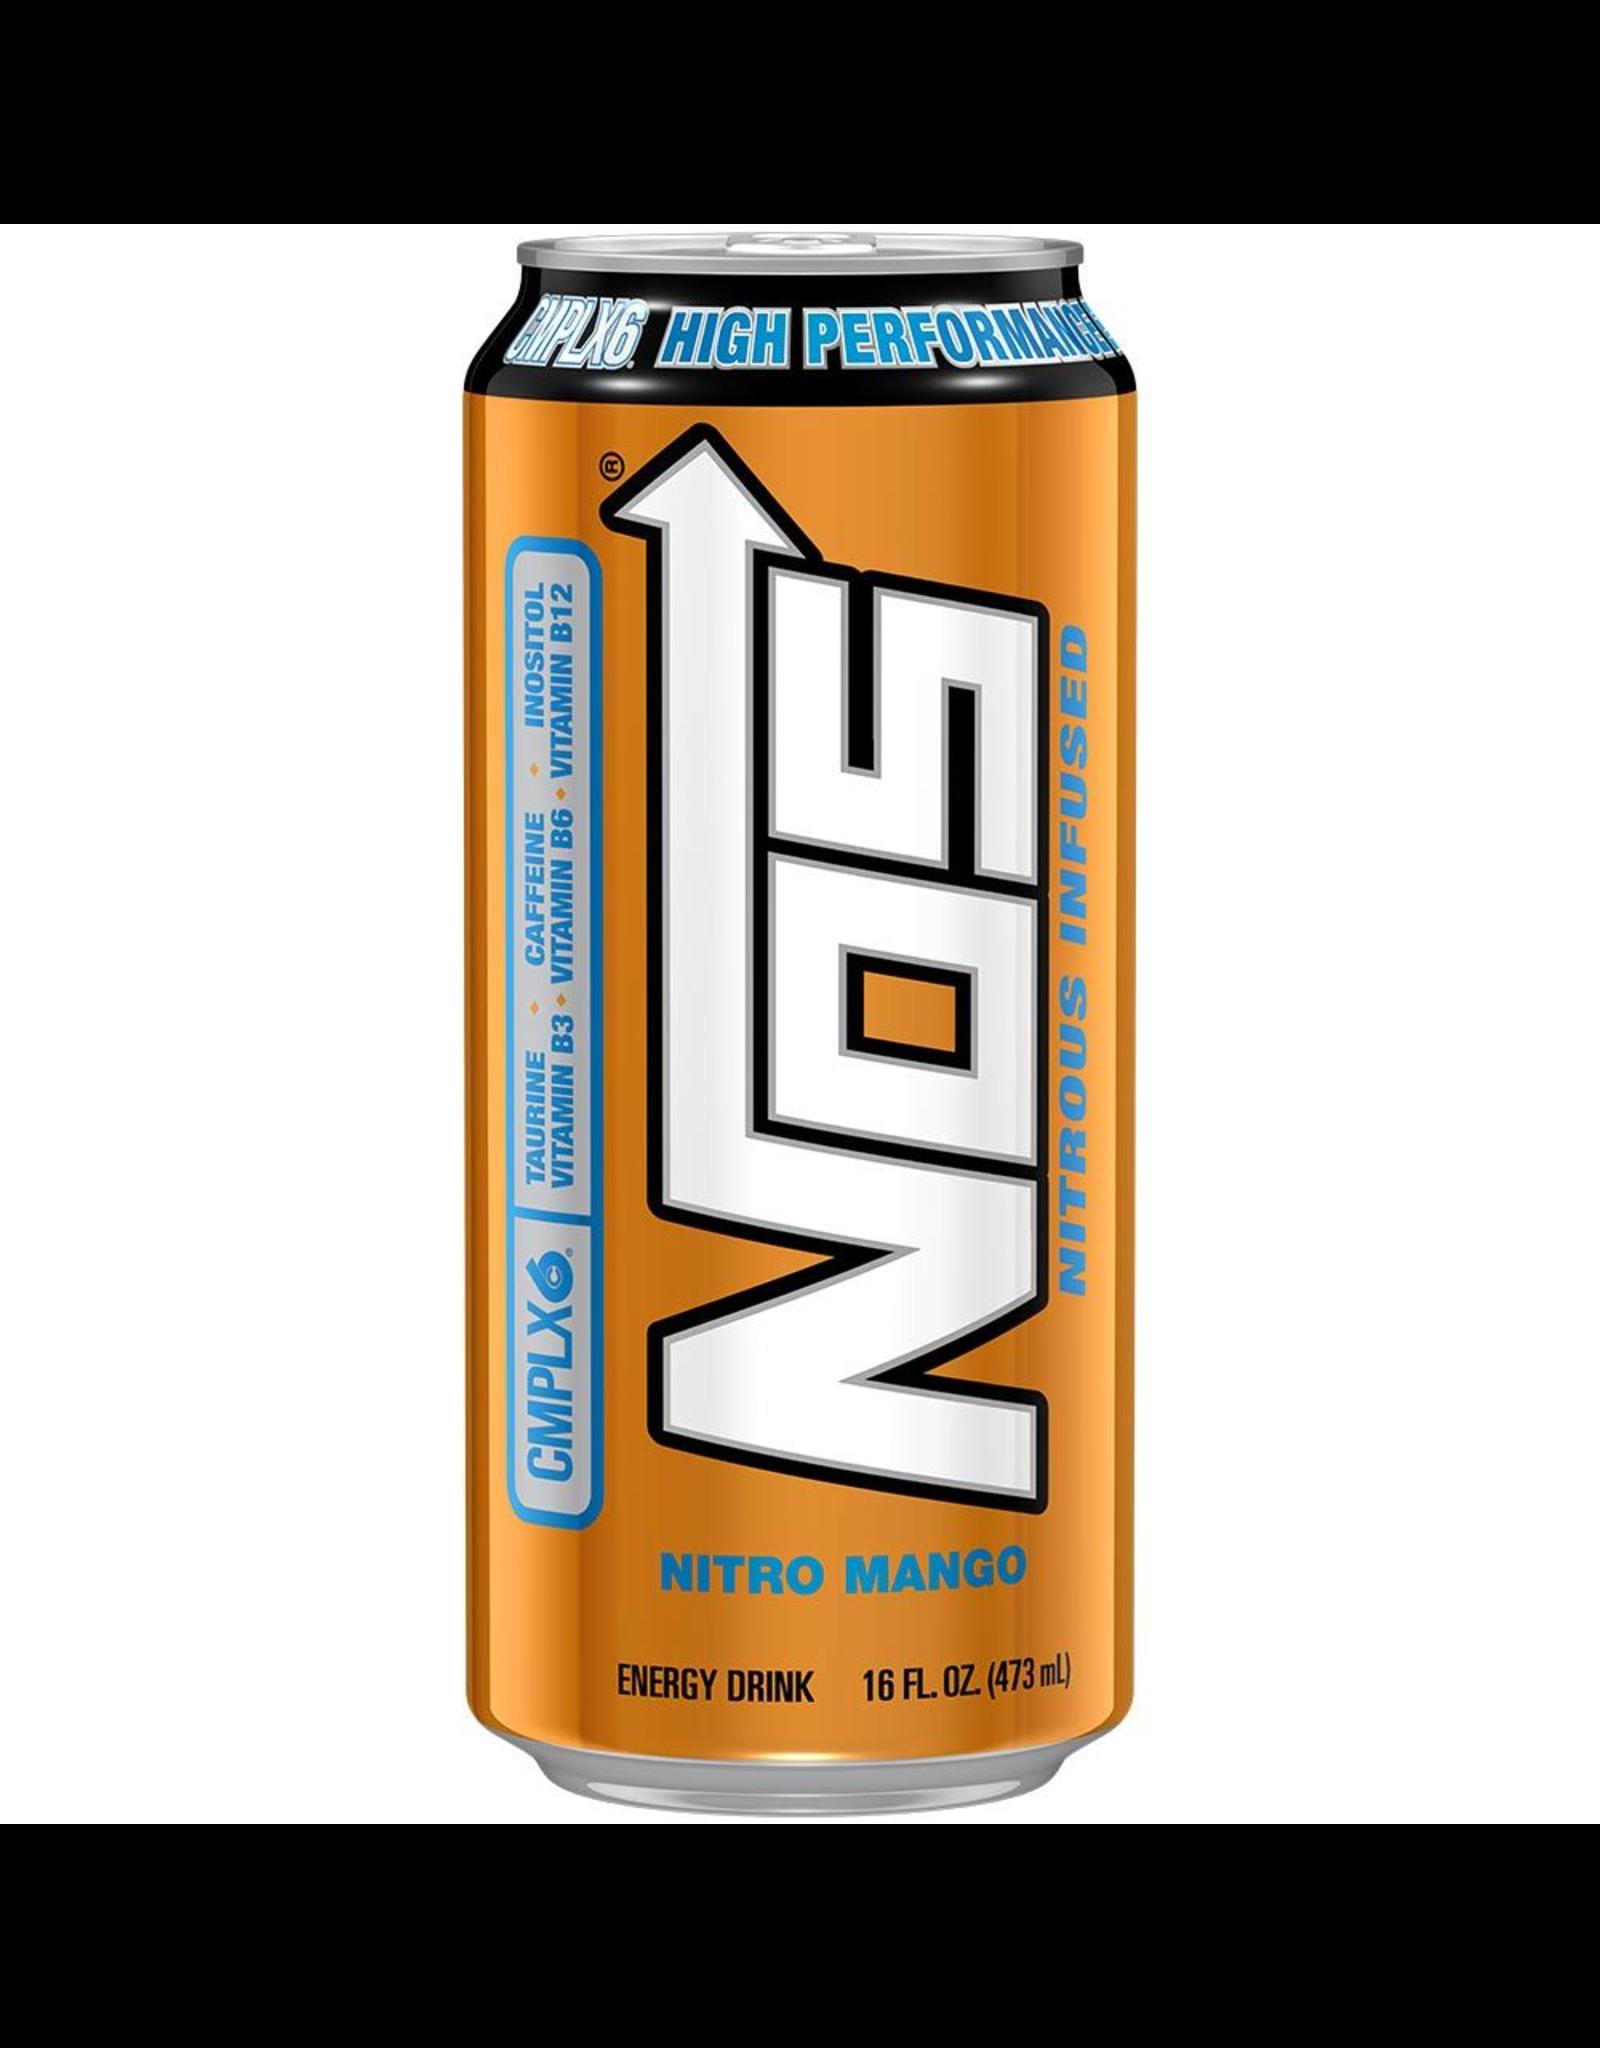 NOS - Nitro Mango - High Performance Energy Drink - 473ml